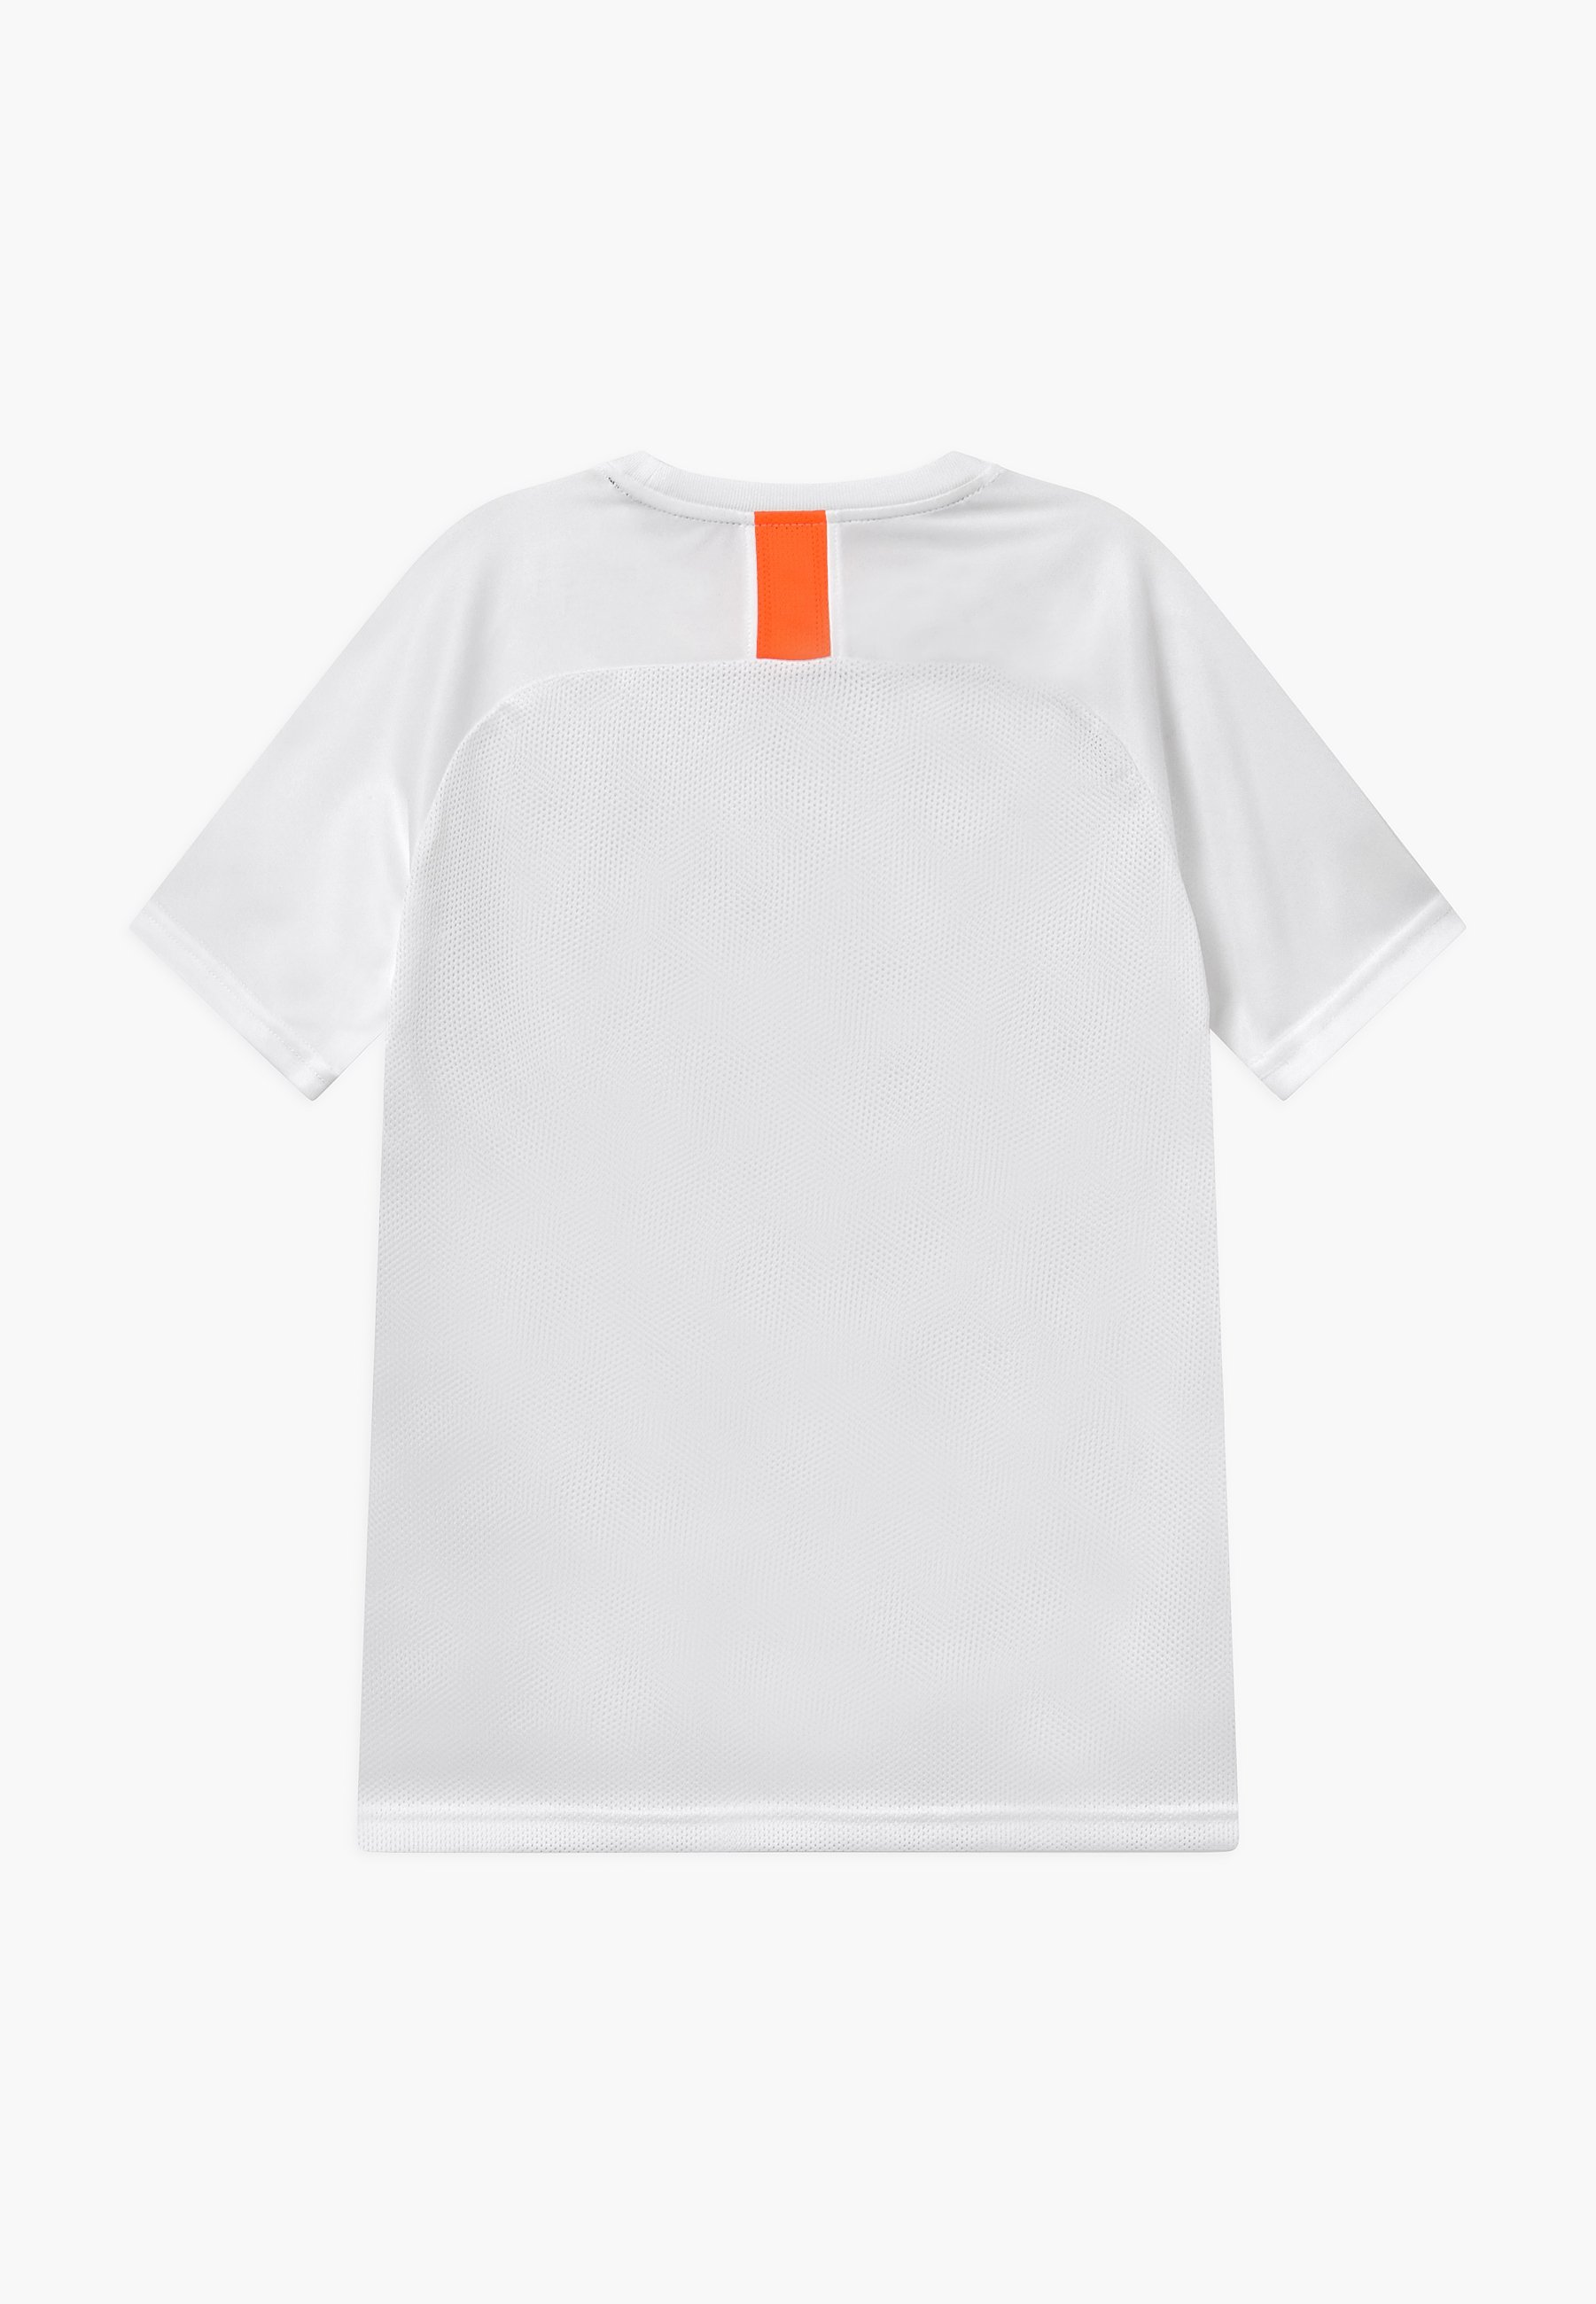 Nike T Skjorte CR7 Dry Hvit Barn | unisportstore.no